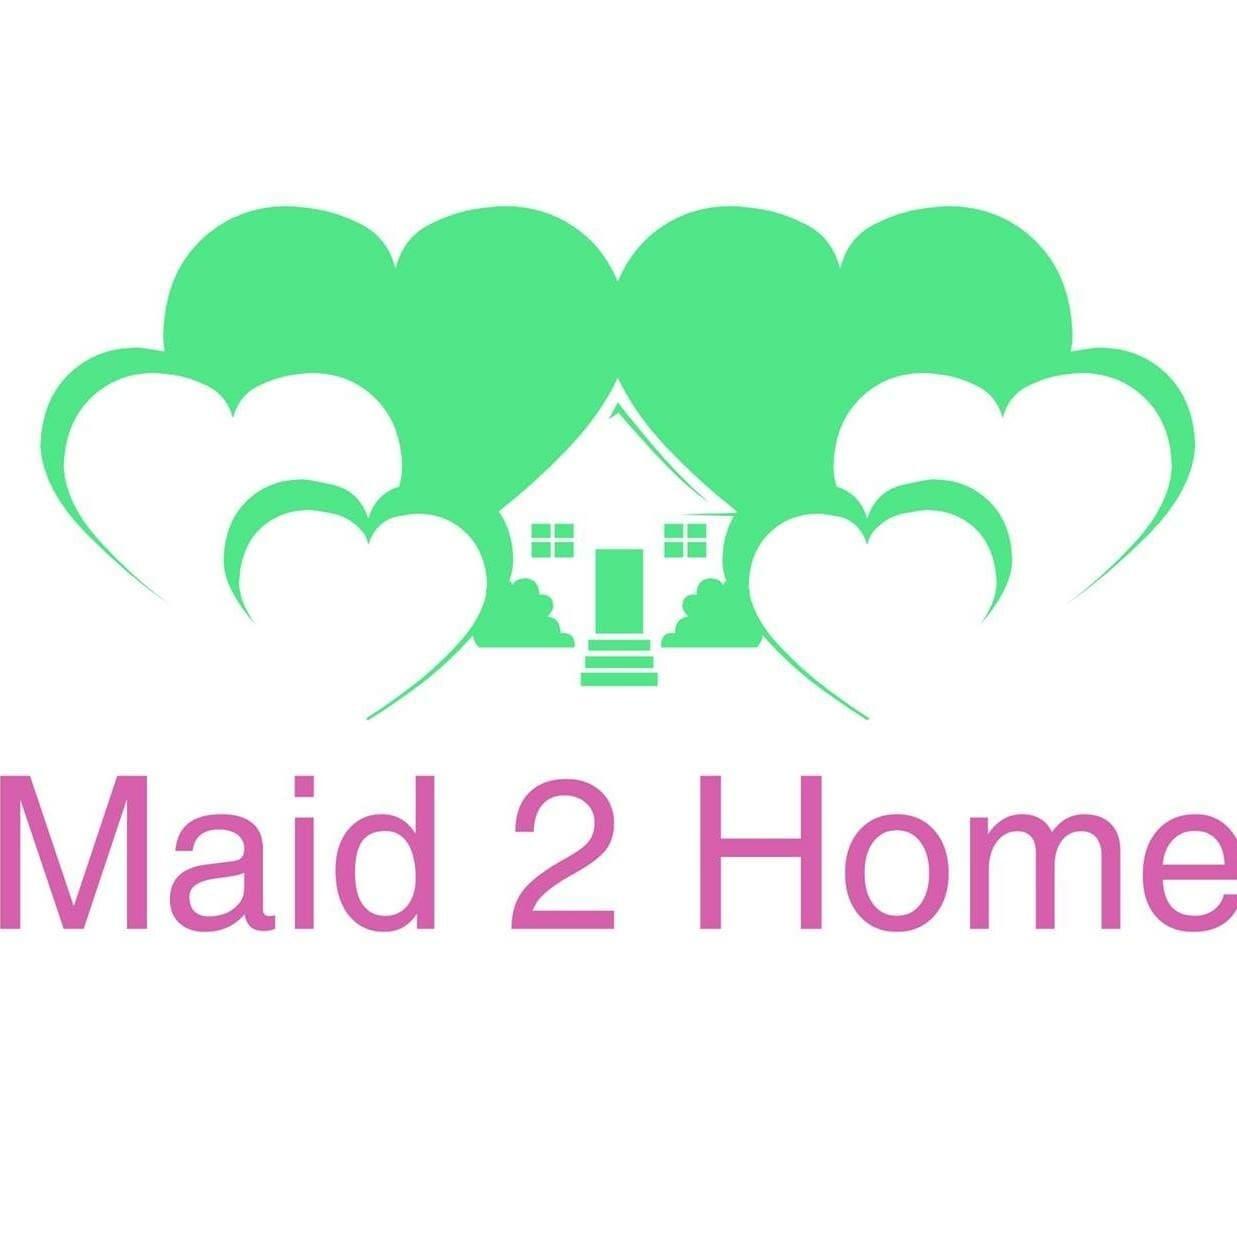 Maid 2 Home - Nuneaton, Warwickshire CV10 9JP - 07848 028163 | ShowMeLocal.com